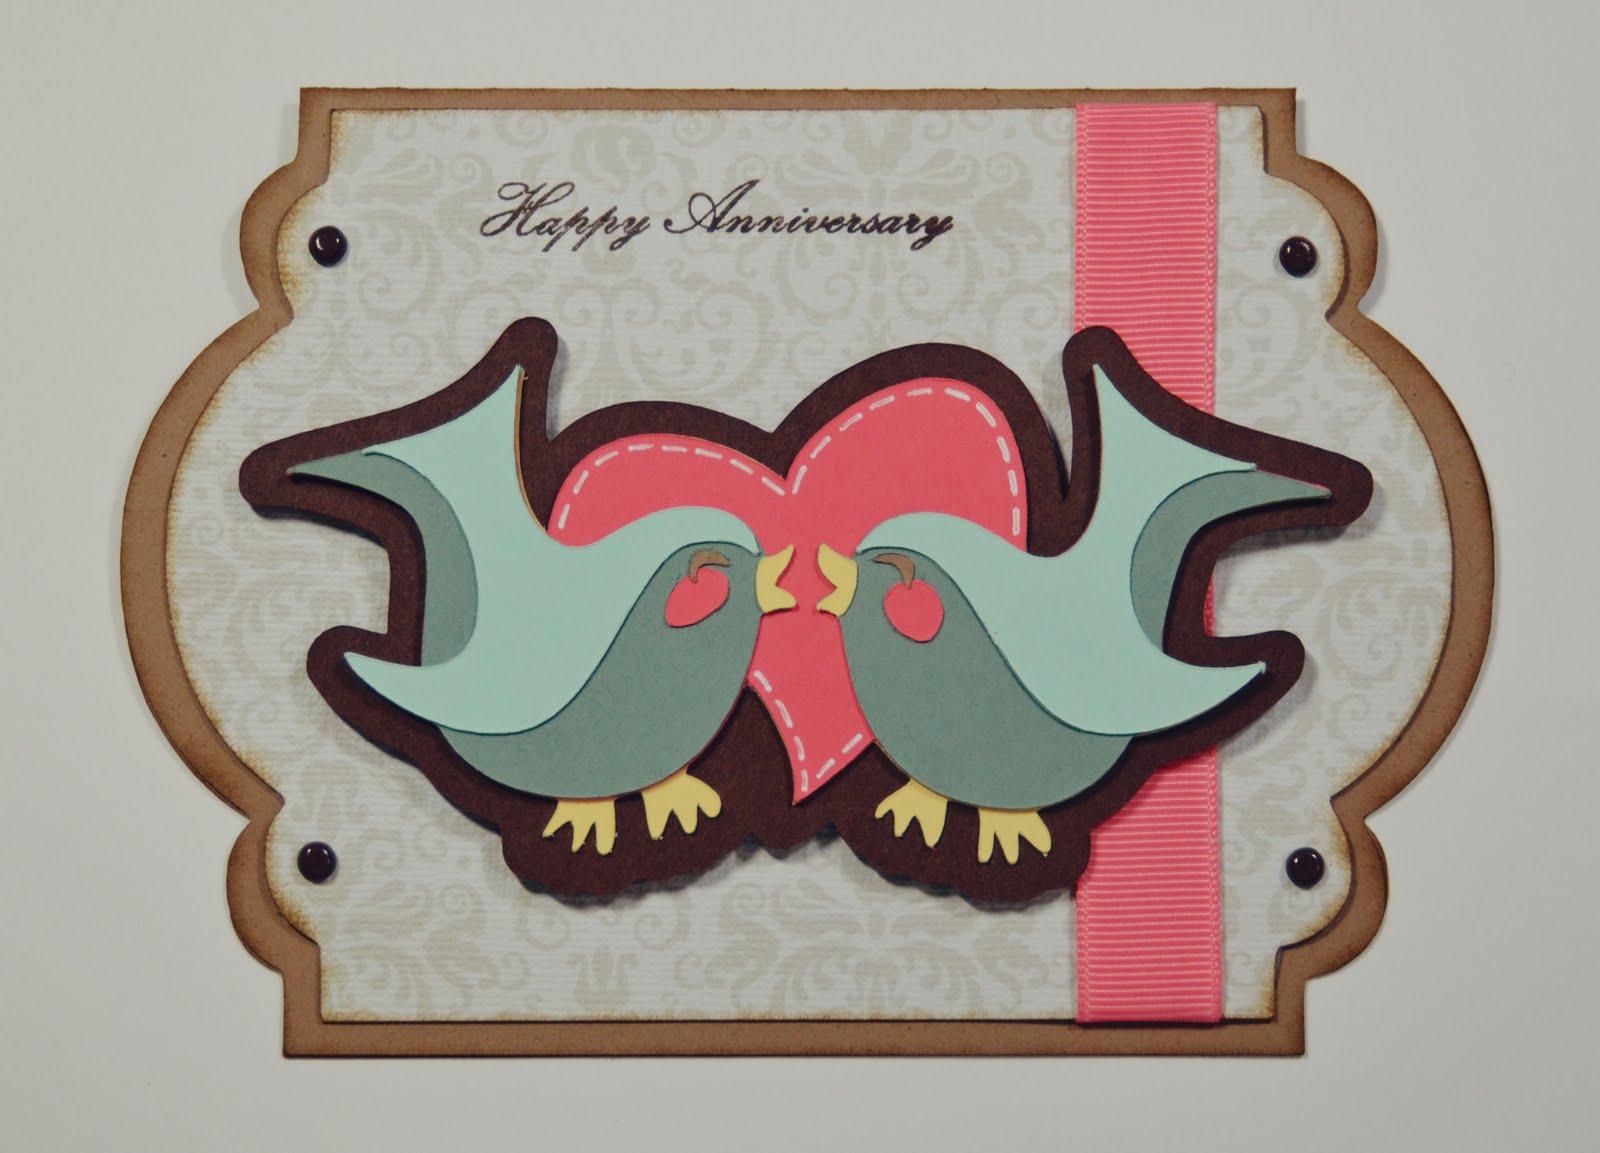 Jeannes paper crafts: happy anniversary!